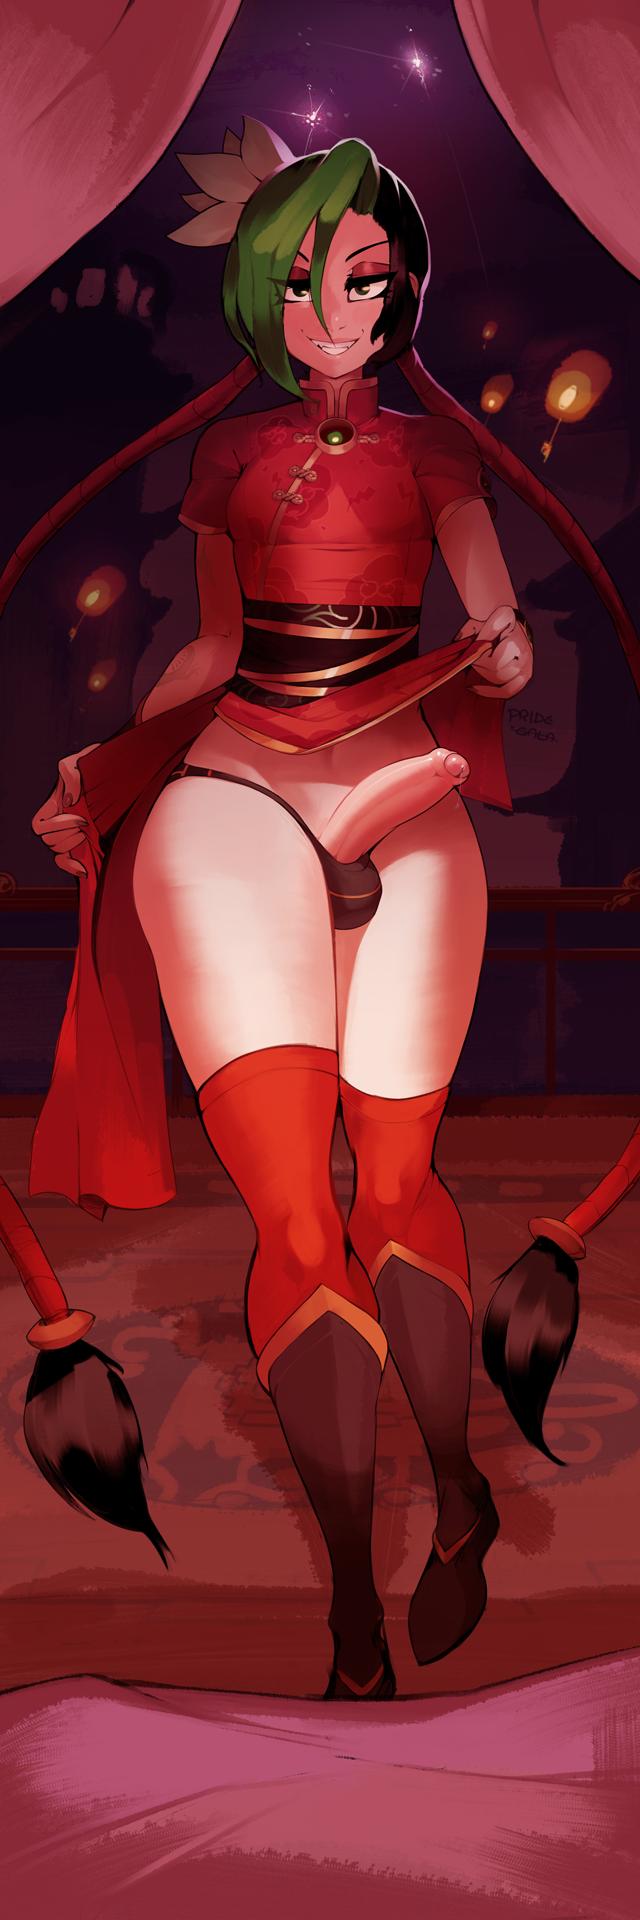 league of sona porn legends Legend of zelda twilight princess agitha